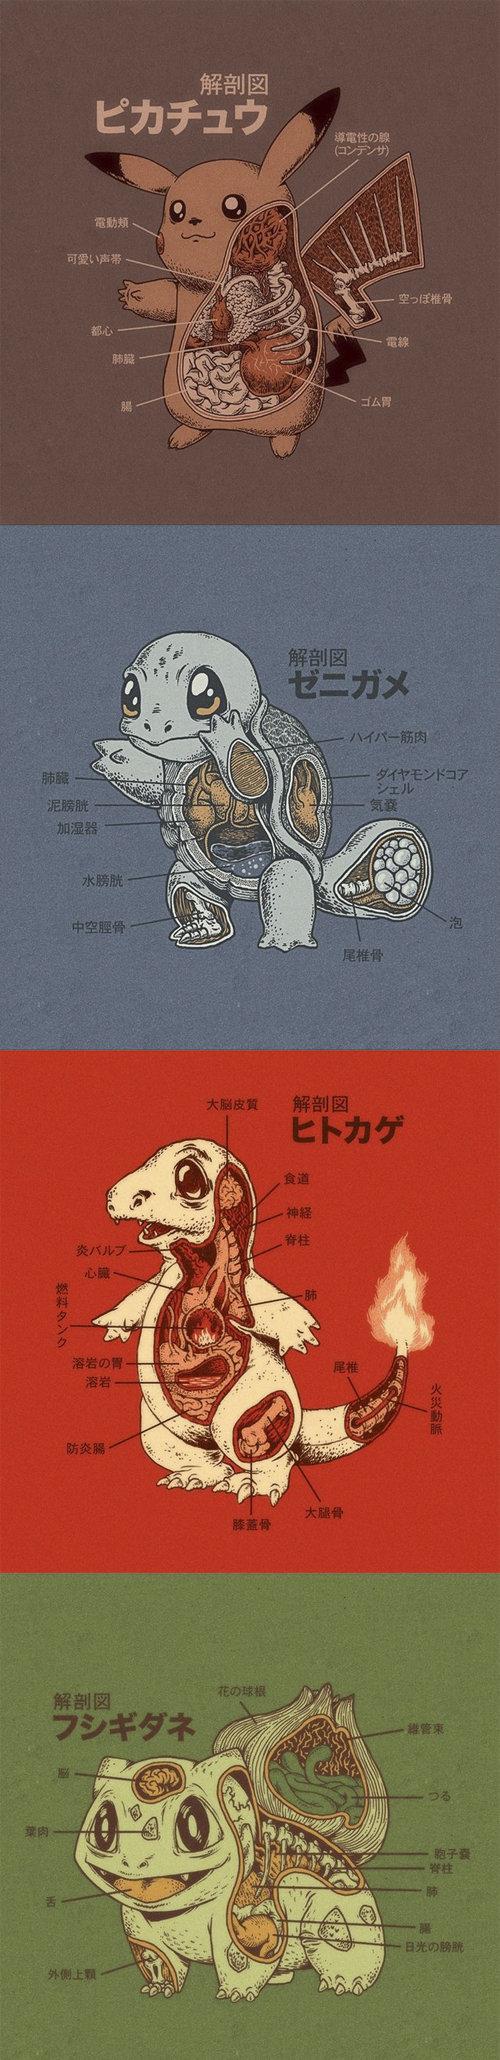 Pokemon's anatomy. .. Needs more English.